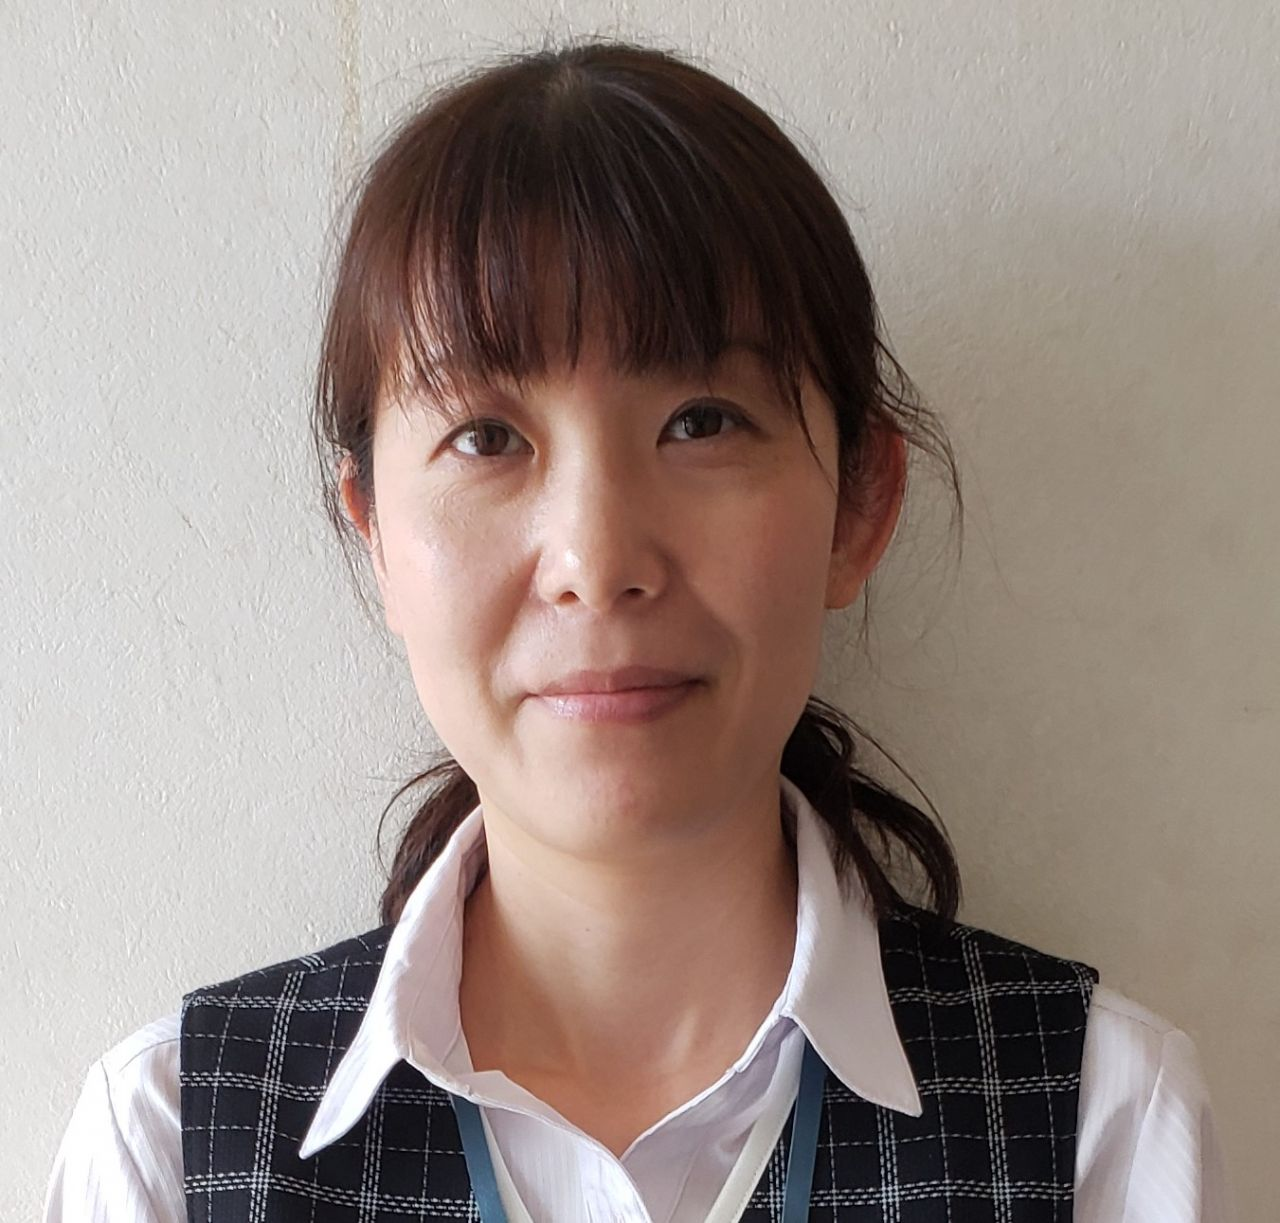 篠田 裕代